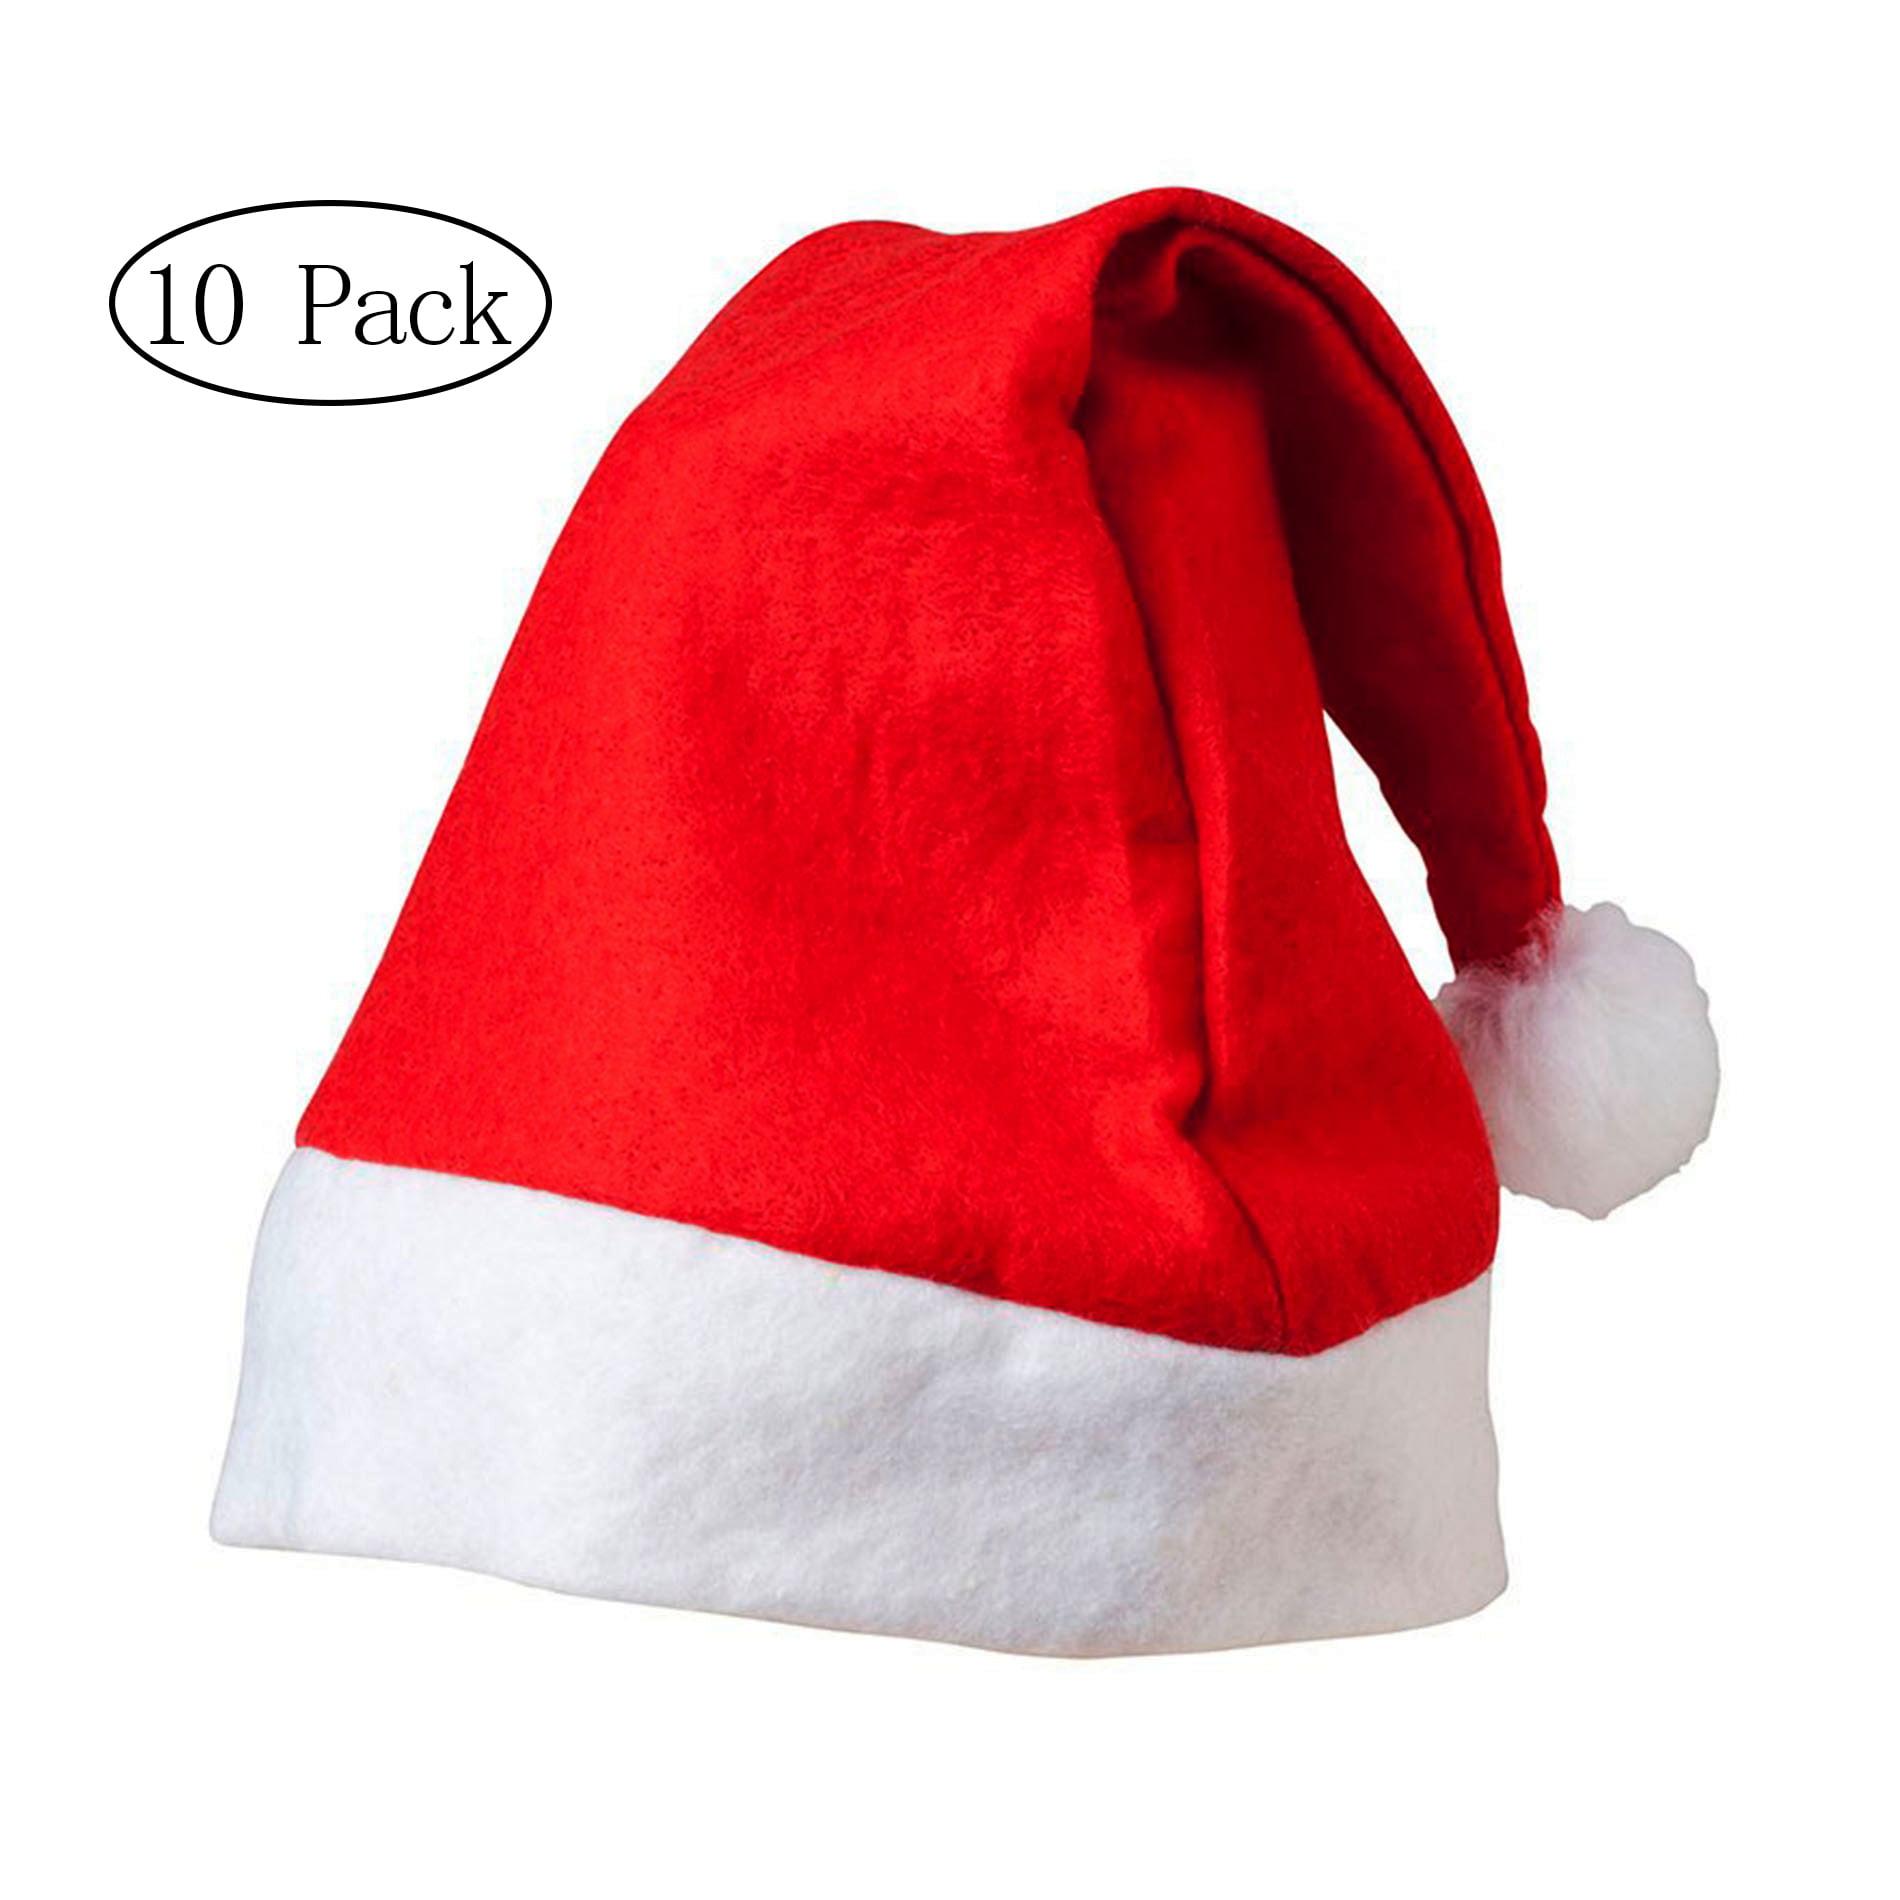 Merry Christmas Hat * Bulk Santa Hats * Pack of 10